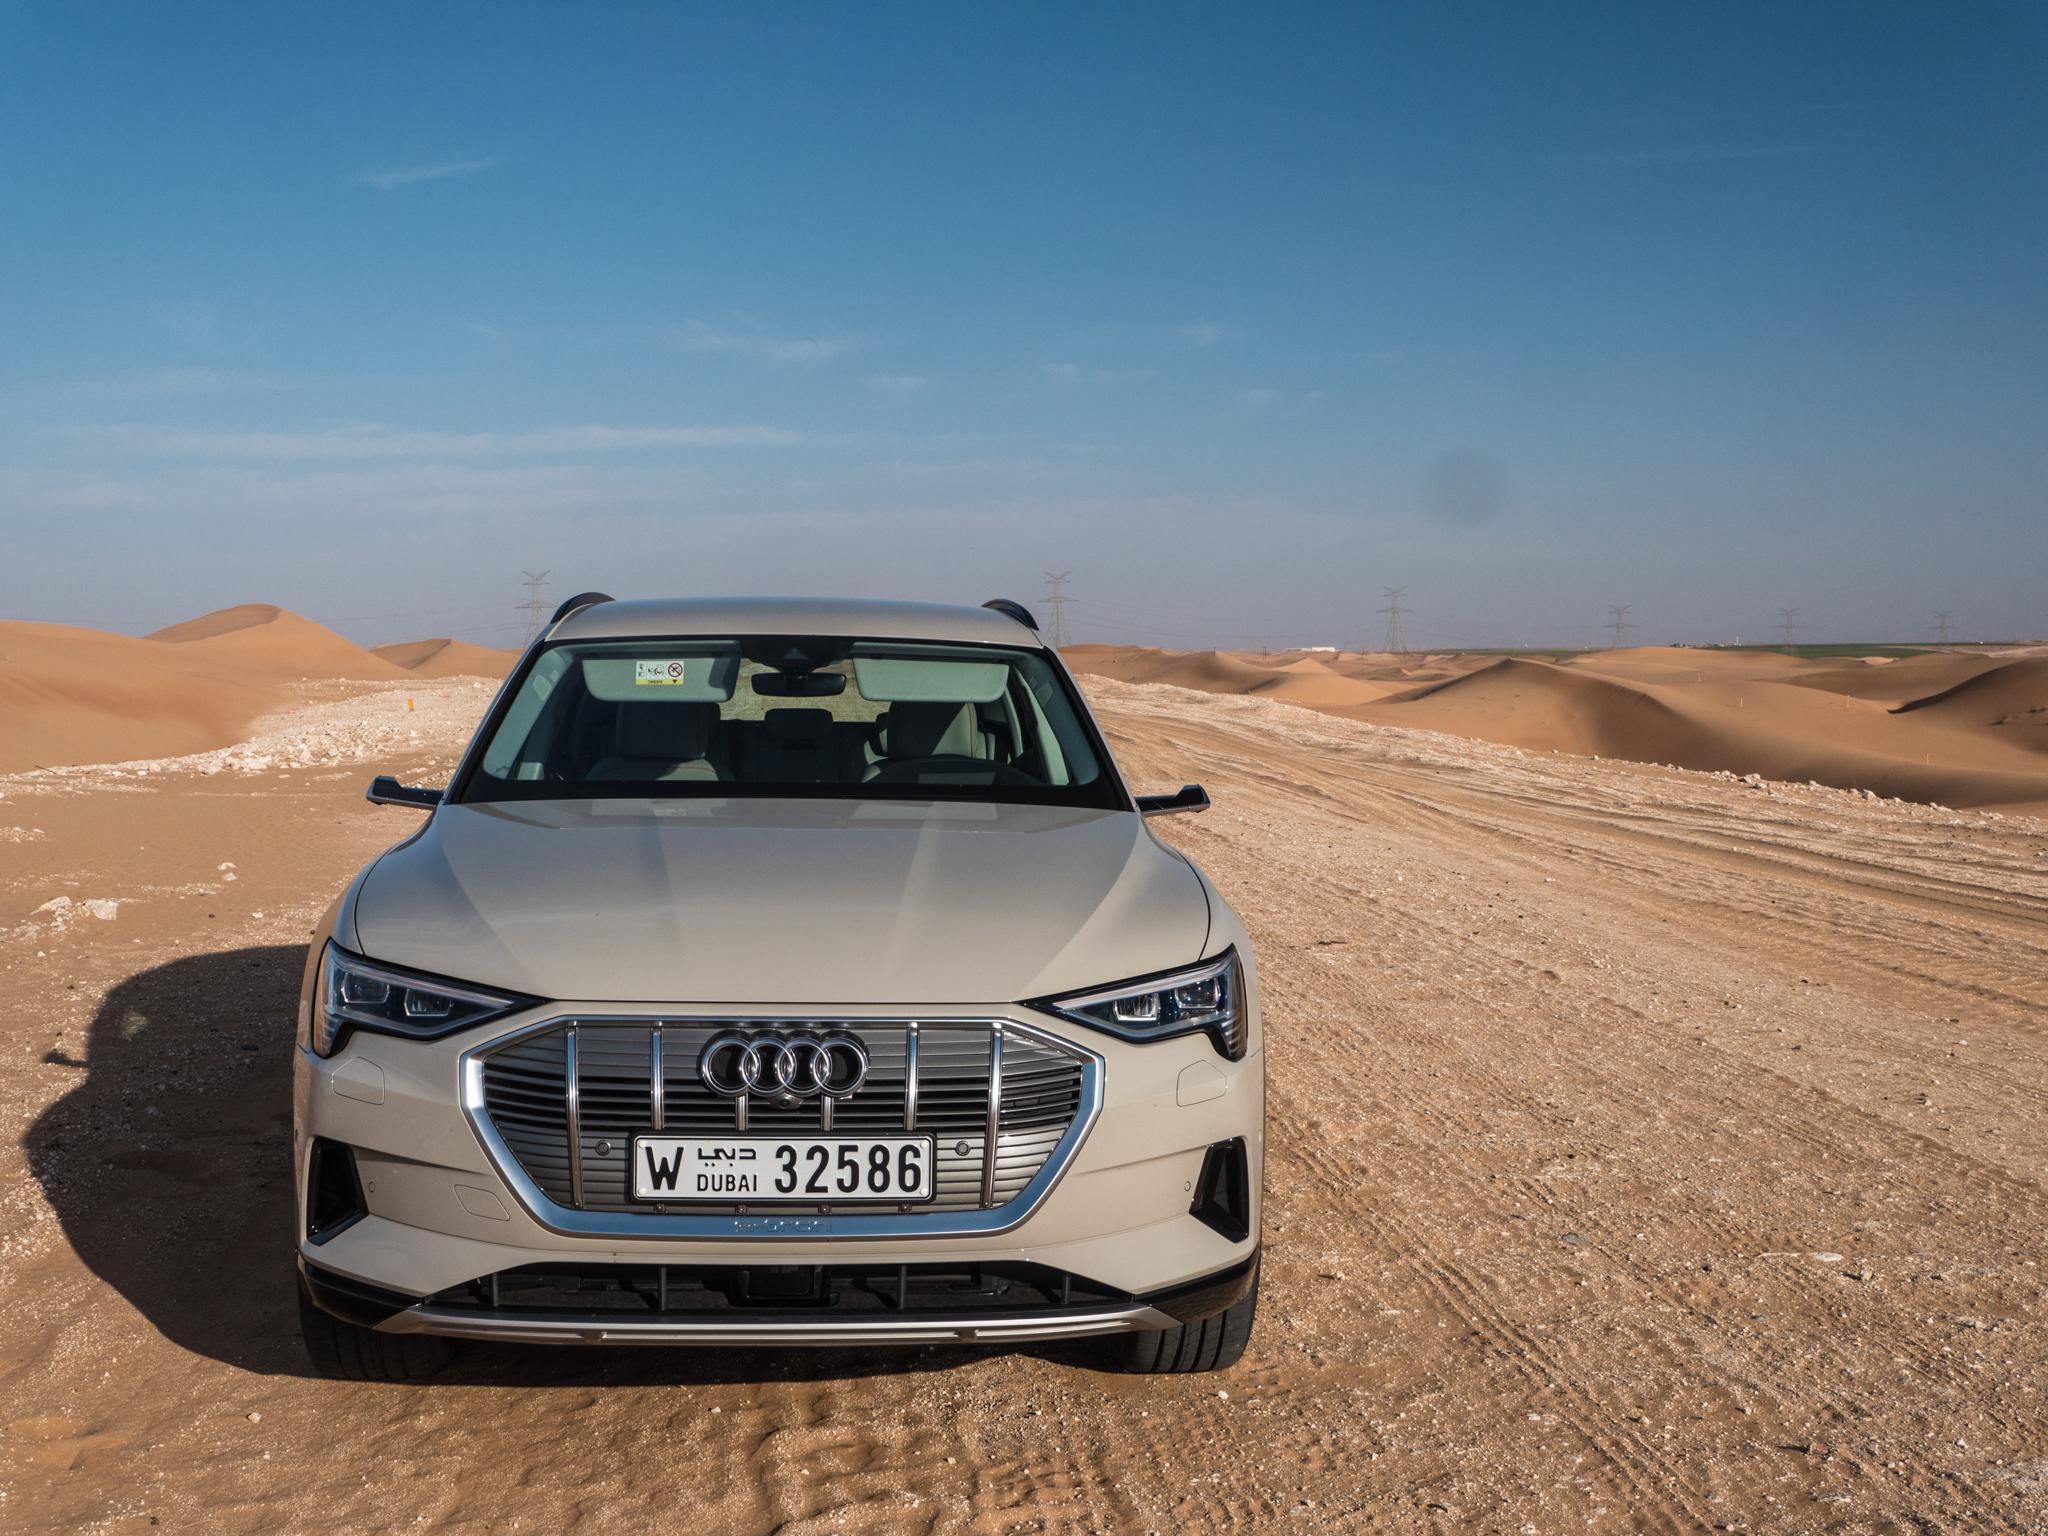 Weve Driven Audis First Proper Electric Car The 2019 E Tron Suv